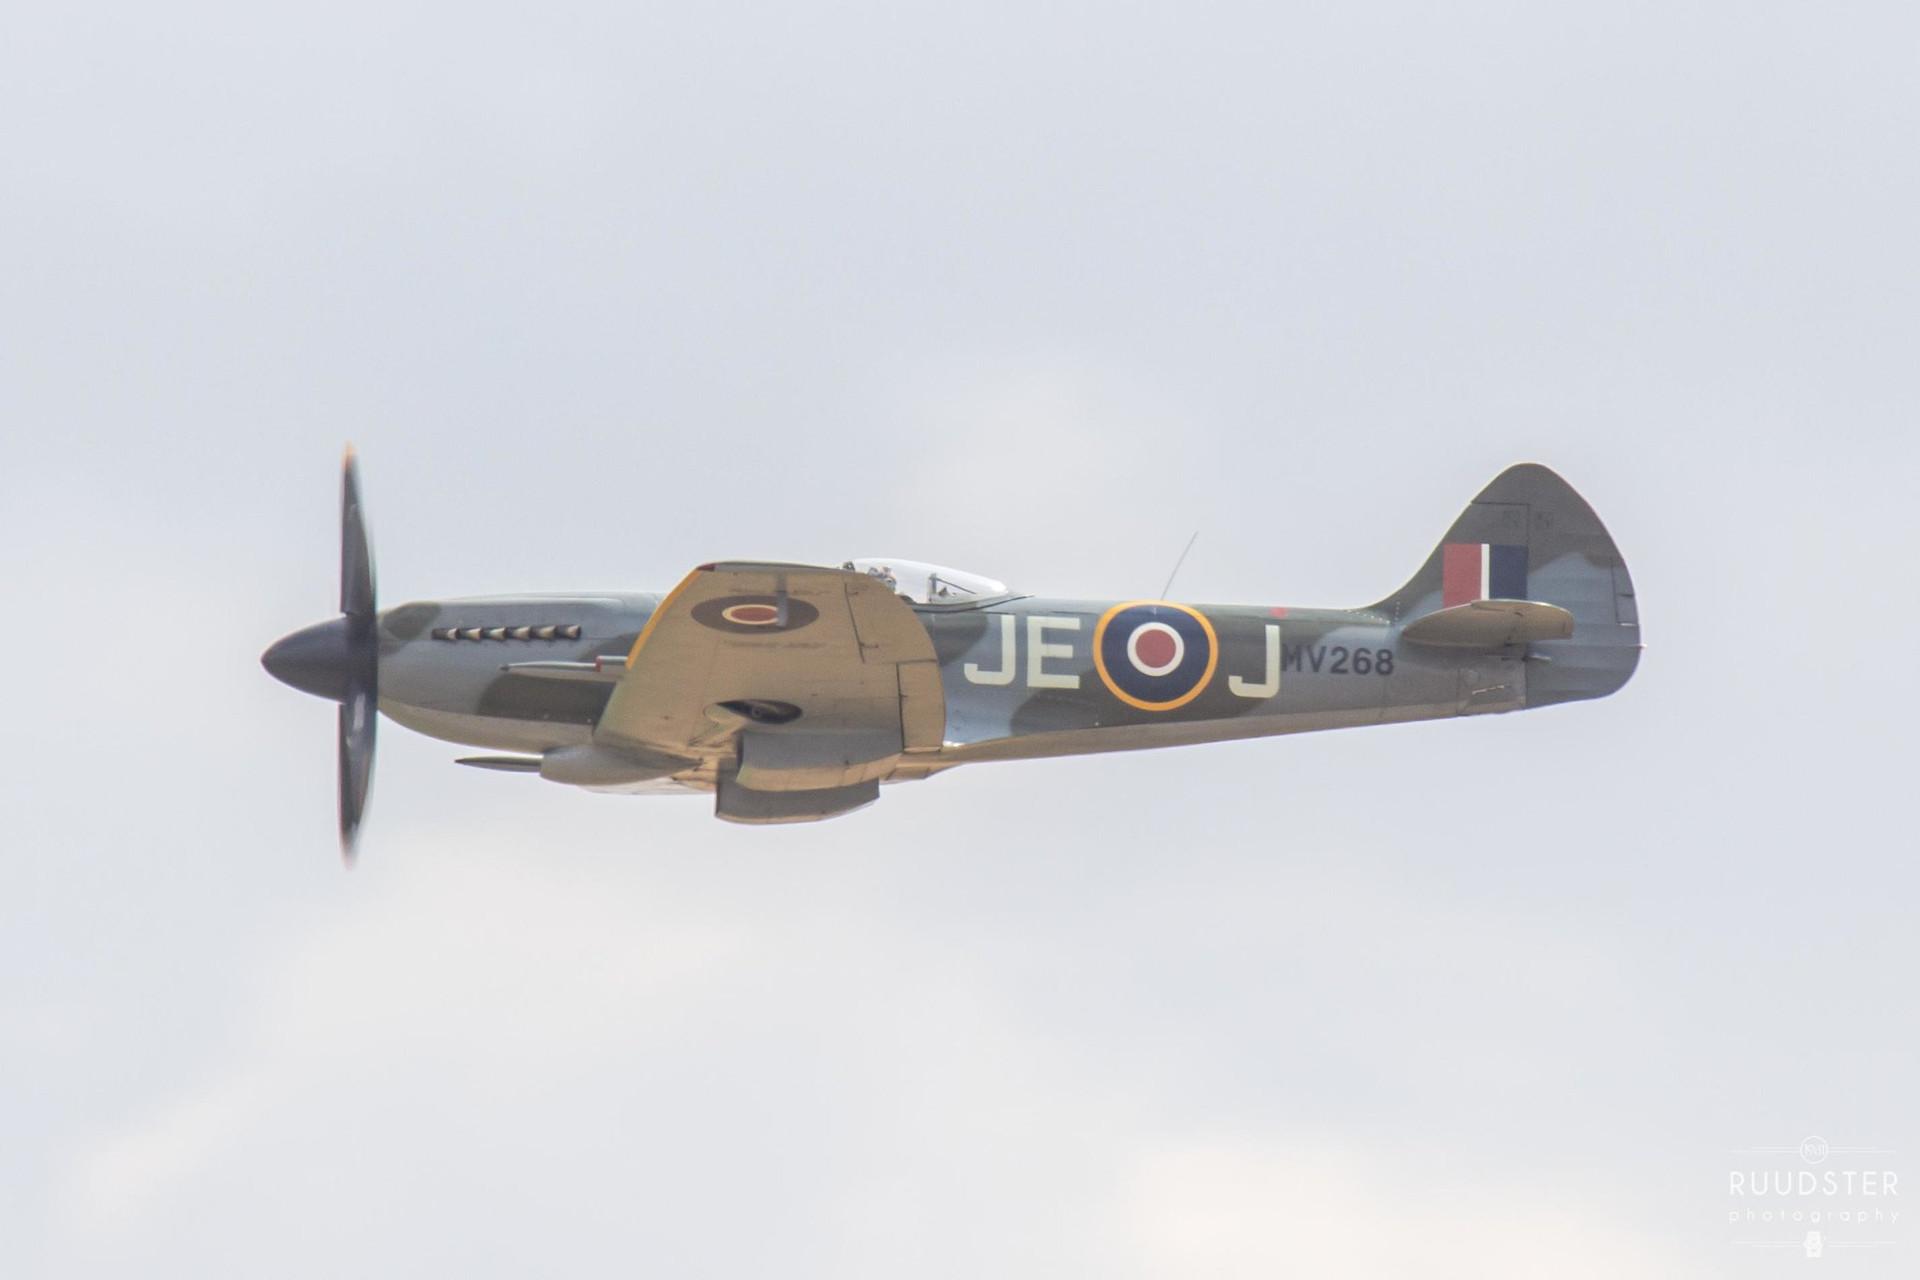 MV268 / G-SPIT   Build: 1944 - Supermarine Spitfire Mk.XIV